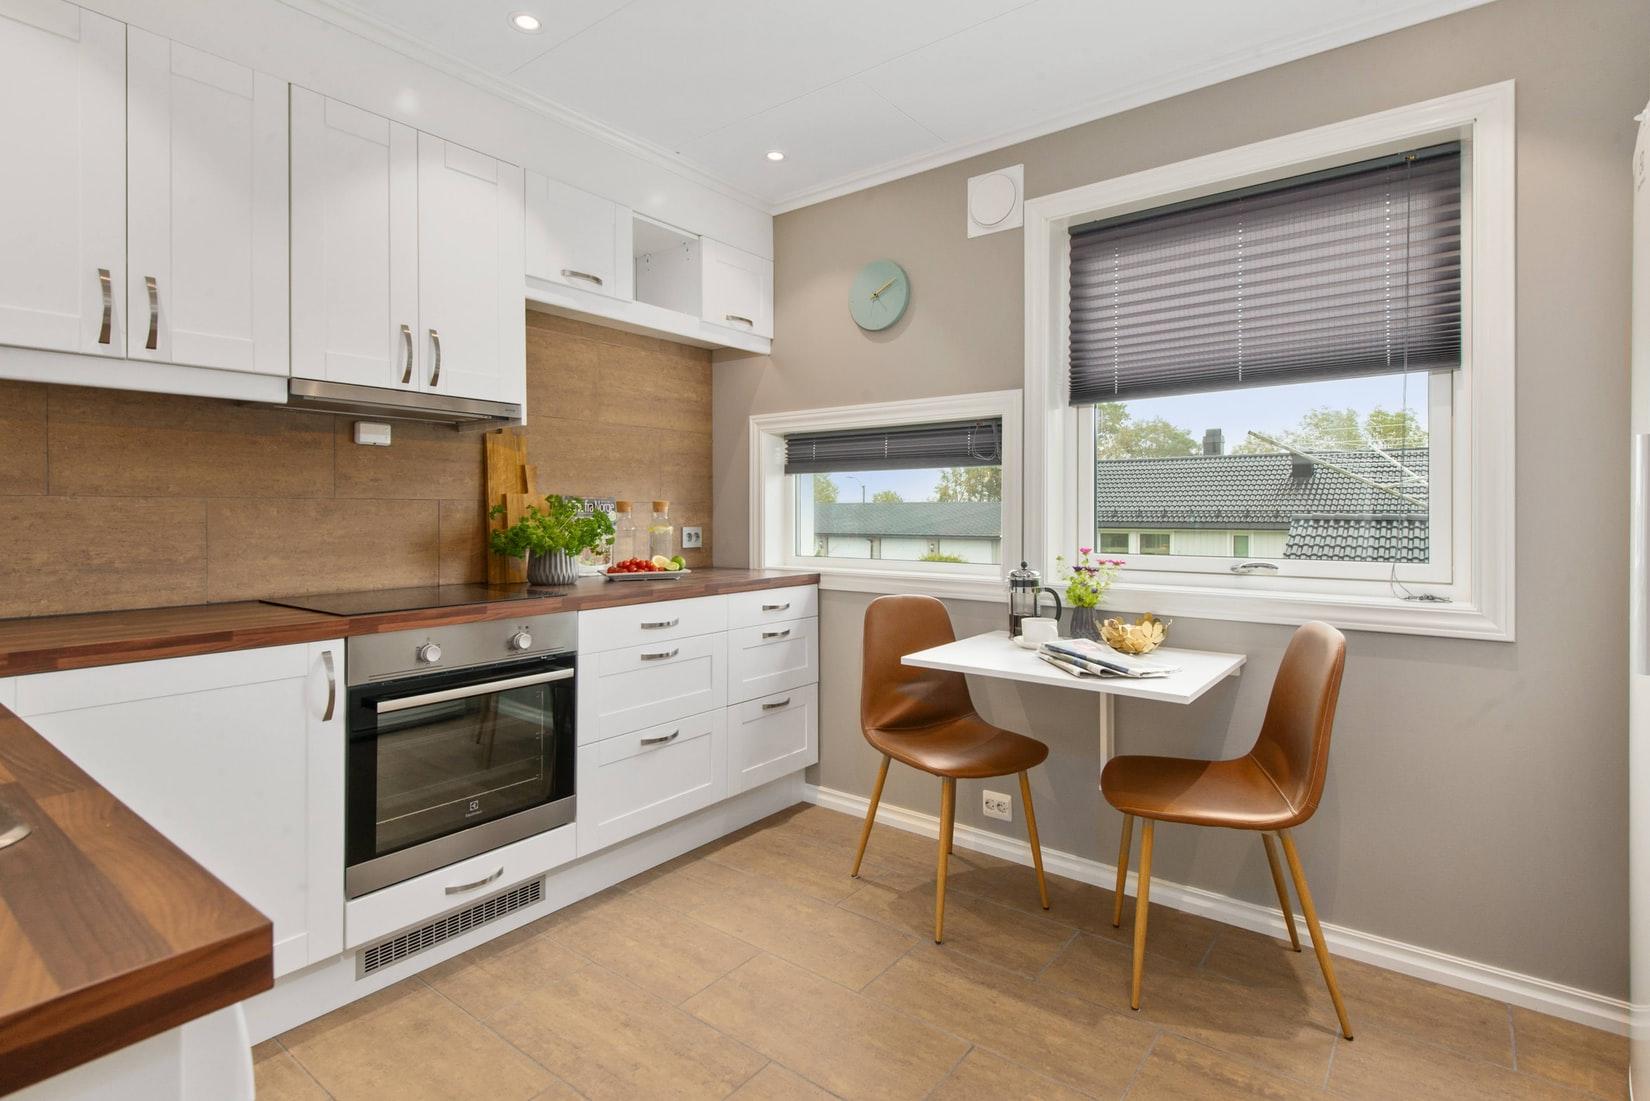 Kitchen Window Treatment Ideas for 2021